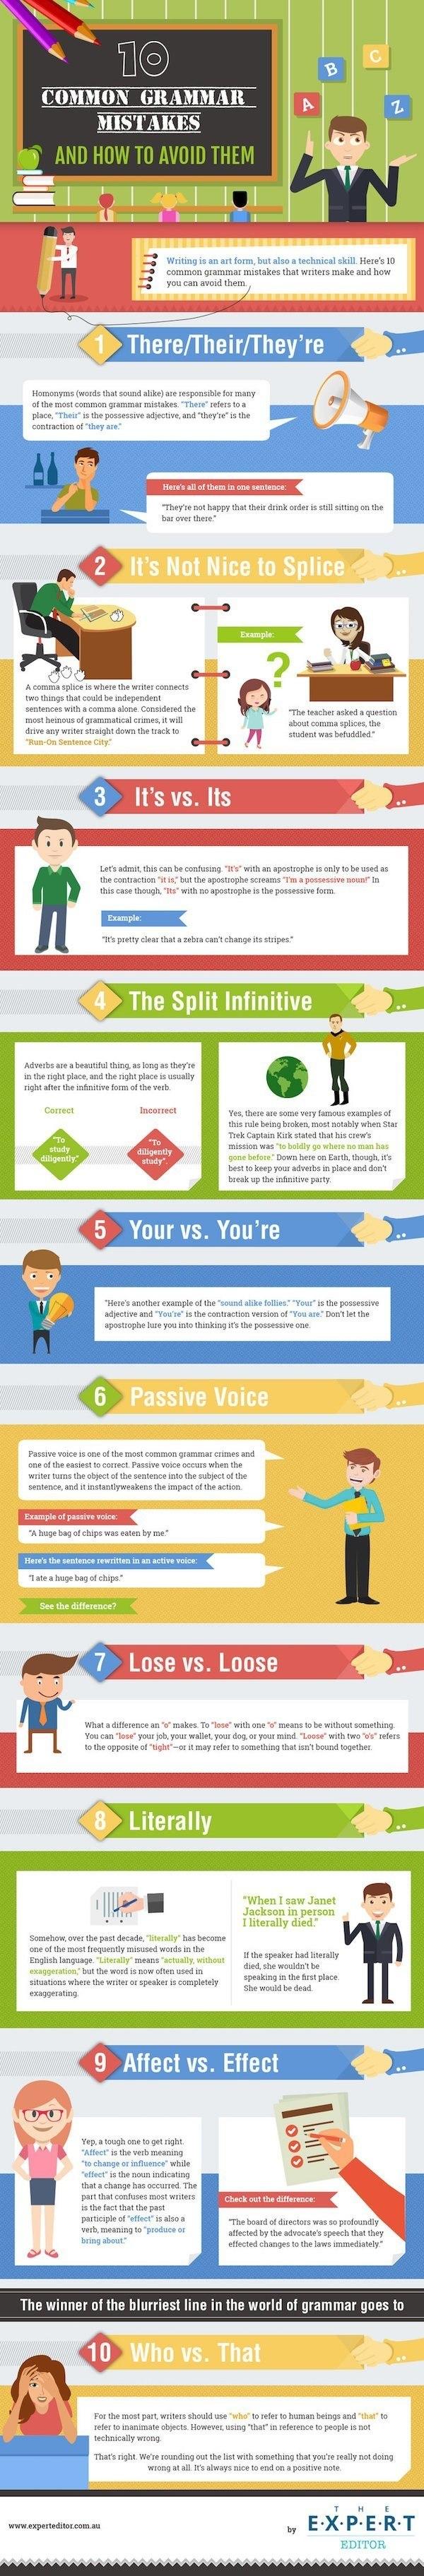 Infographic: 10 Common Grammar Mistakes